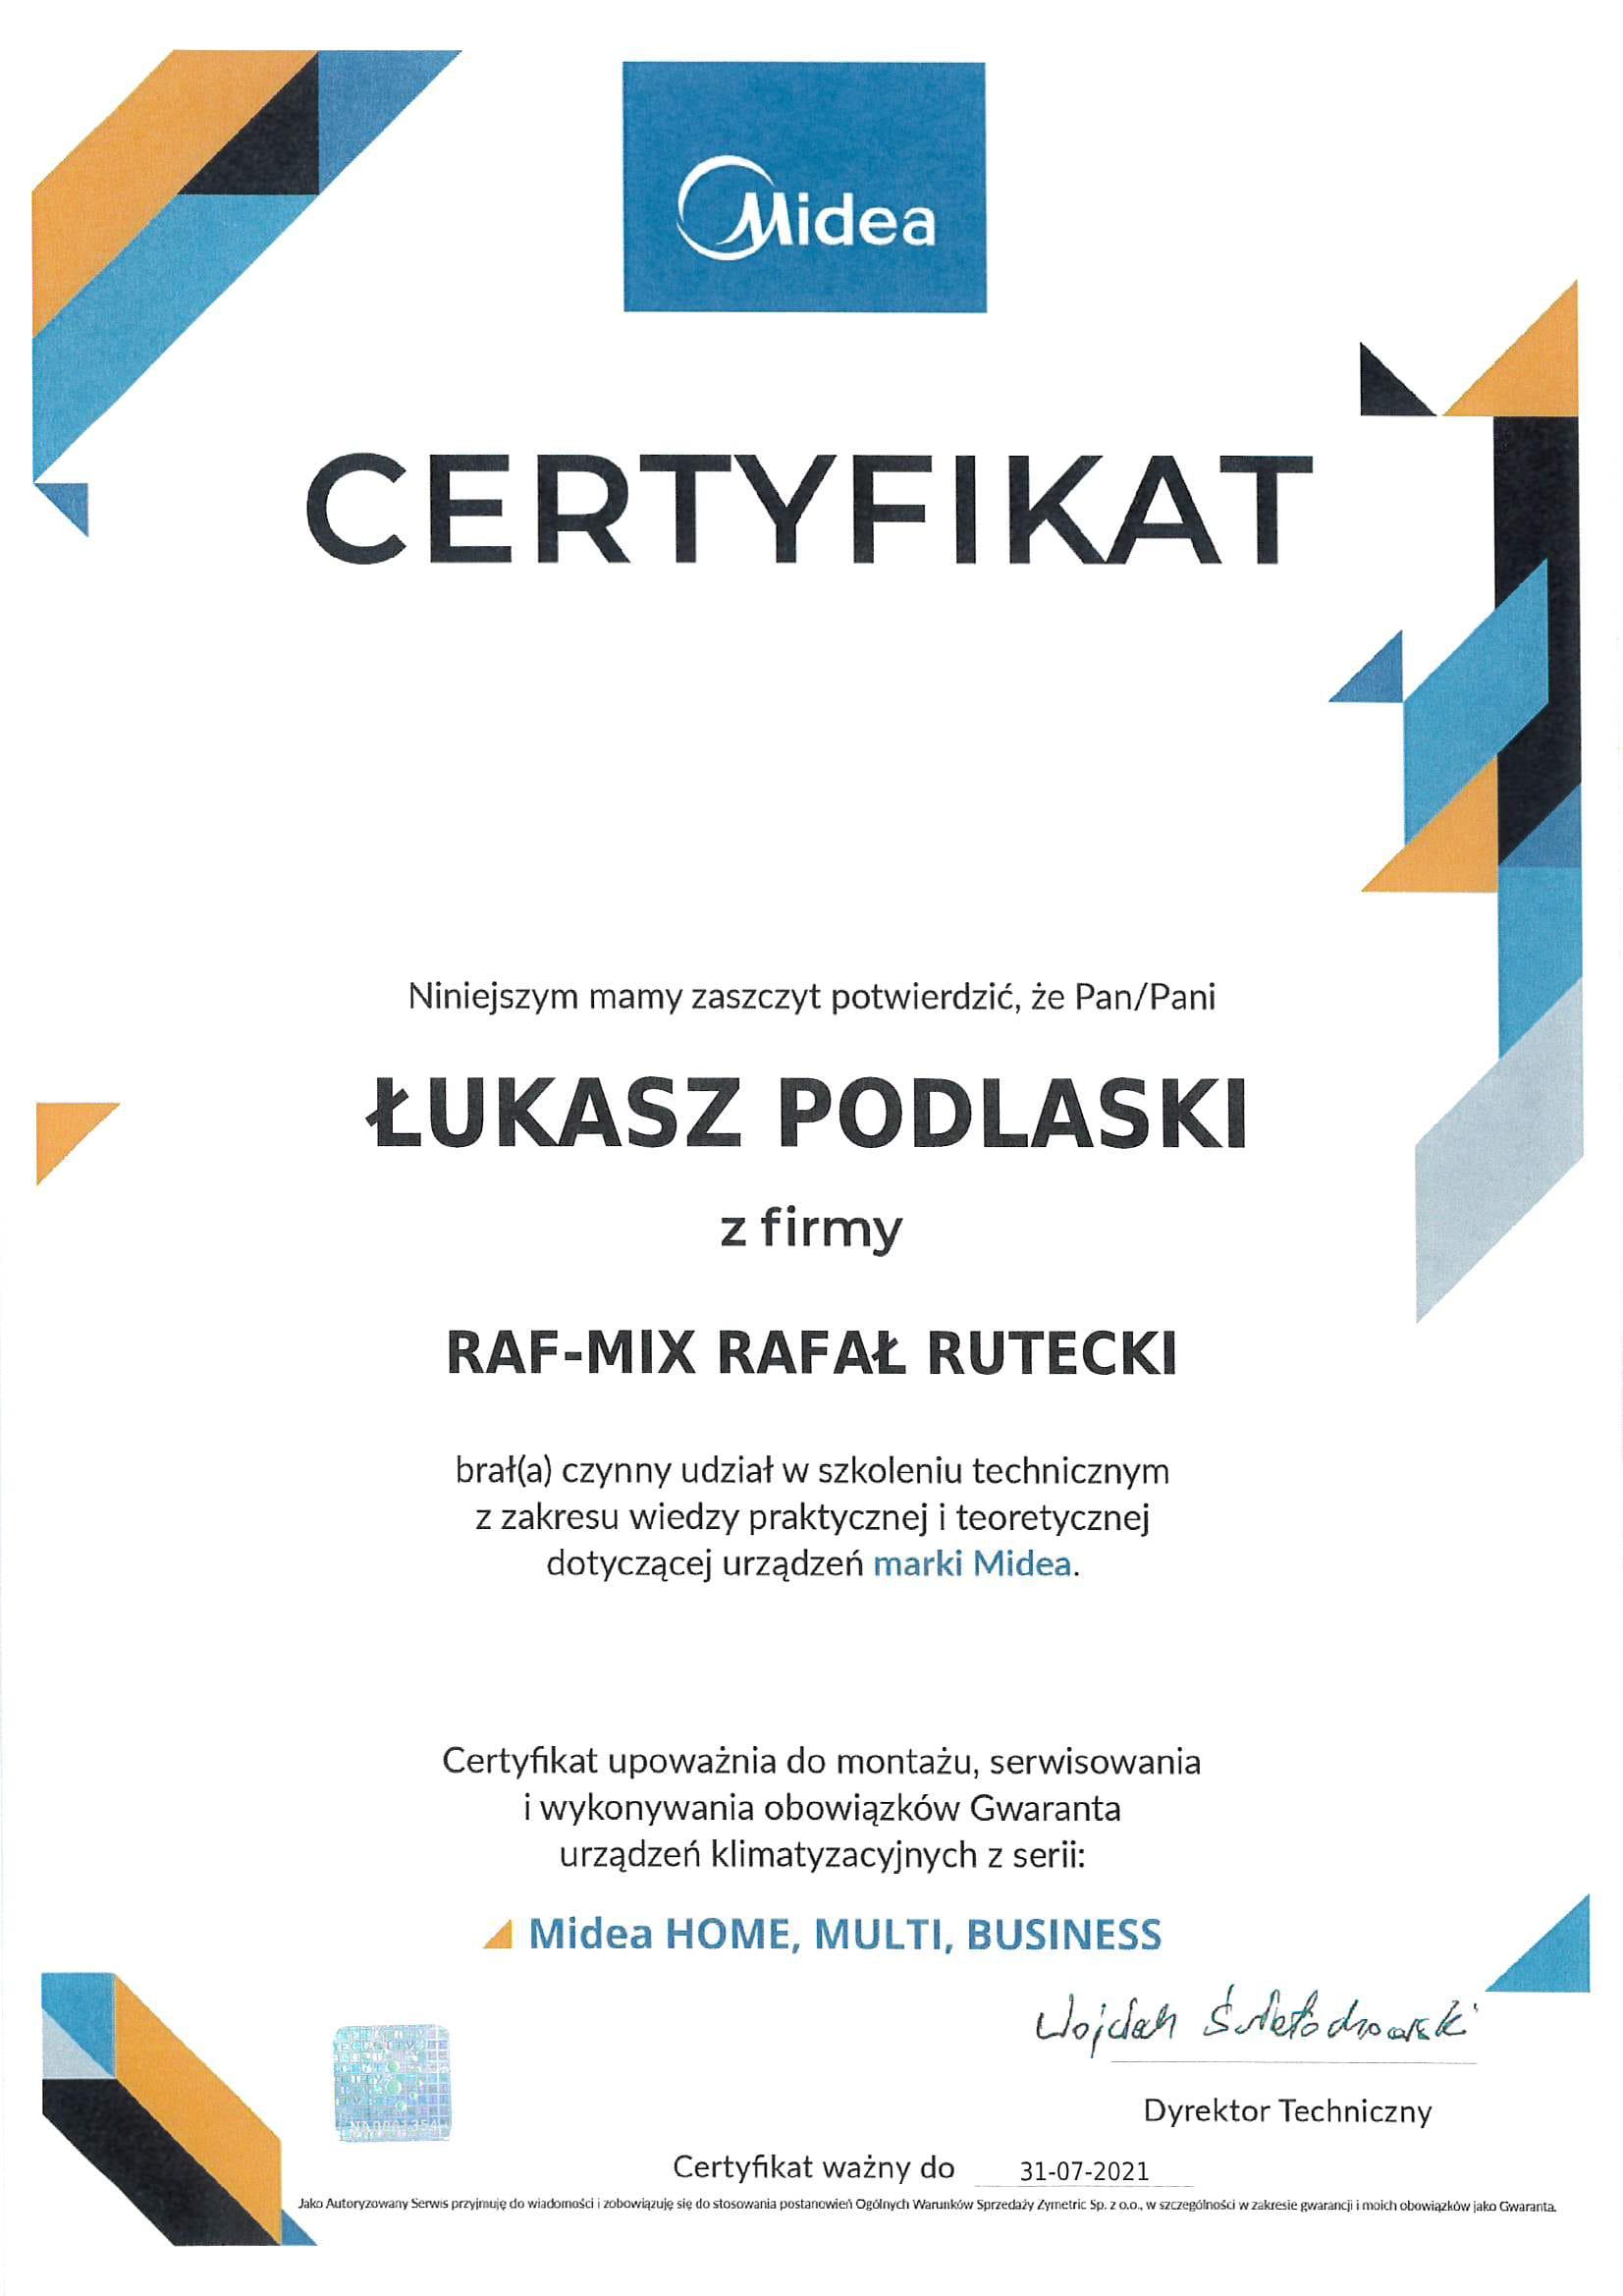 raf-mix o nas certyfikat